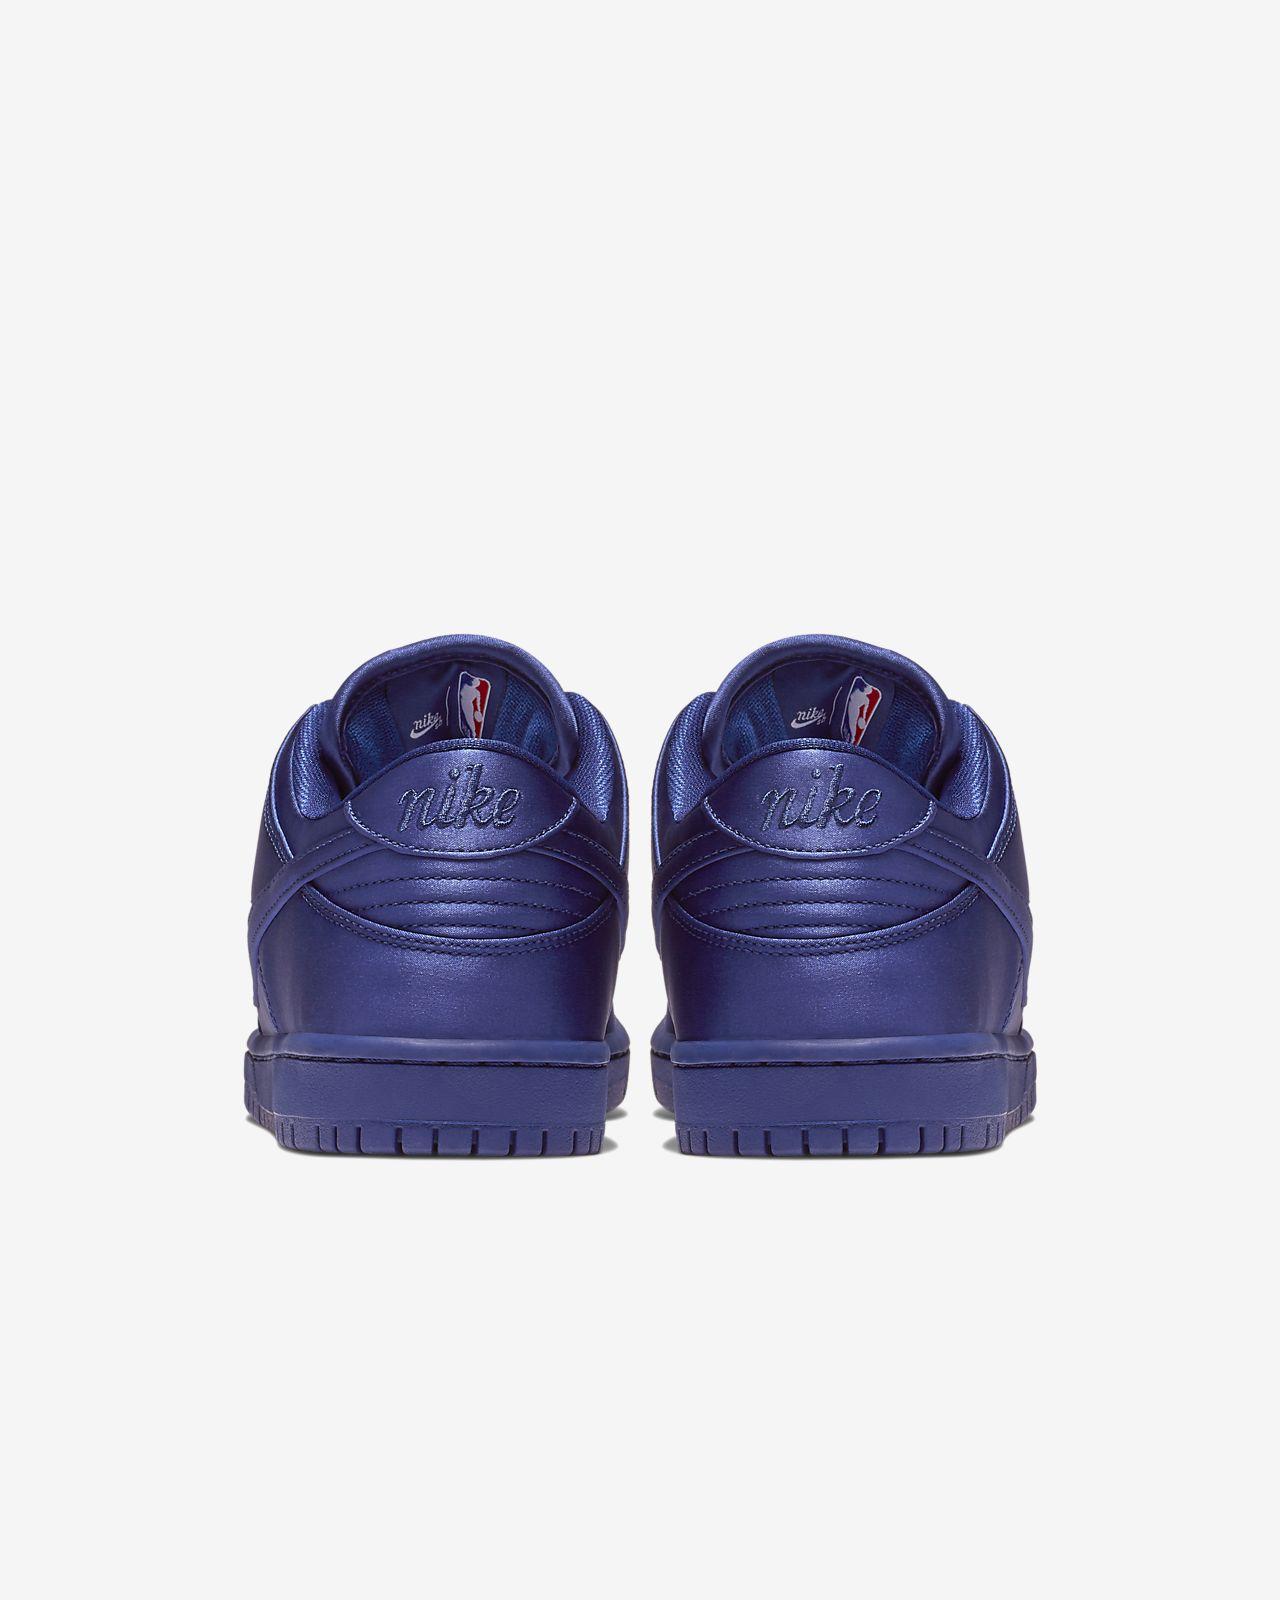 size 40 274bf 677f2 ... Nike SB Dunk Low TRD NBA Skate Shoe